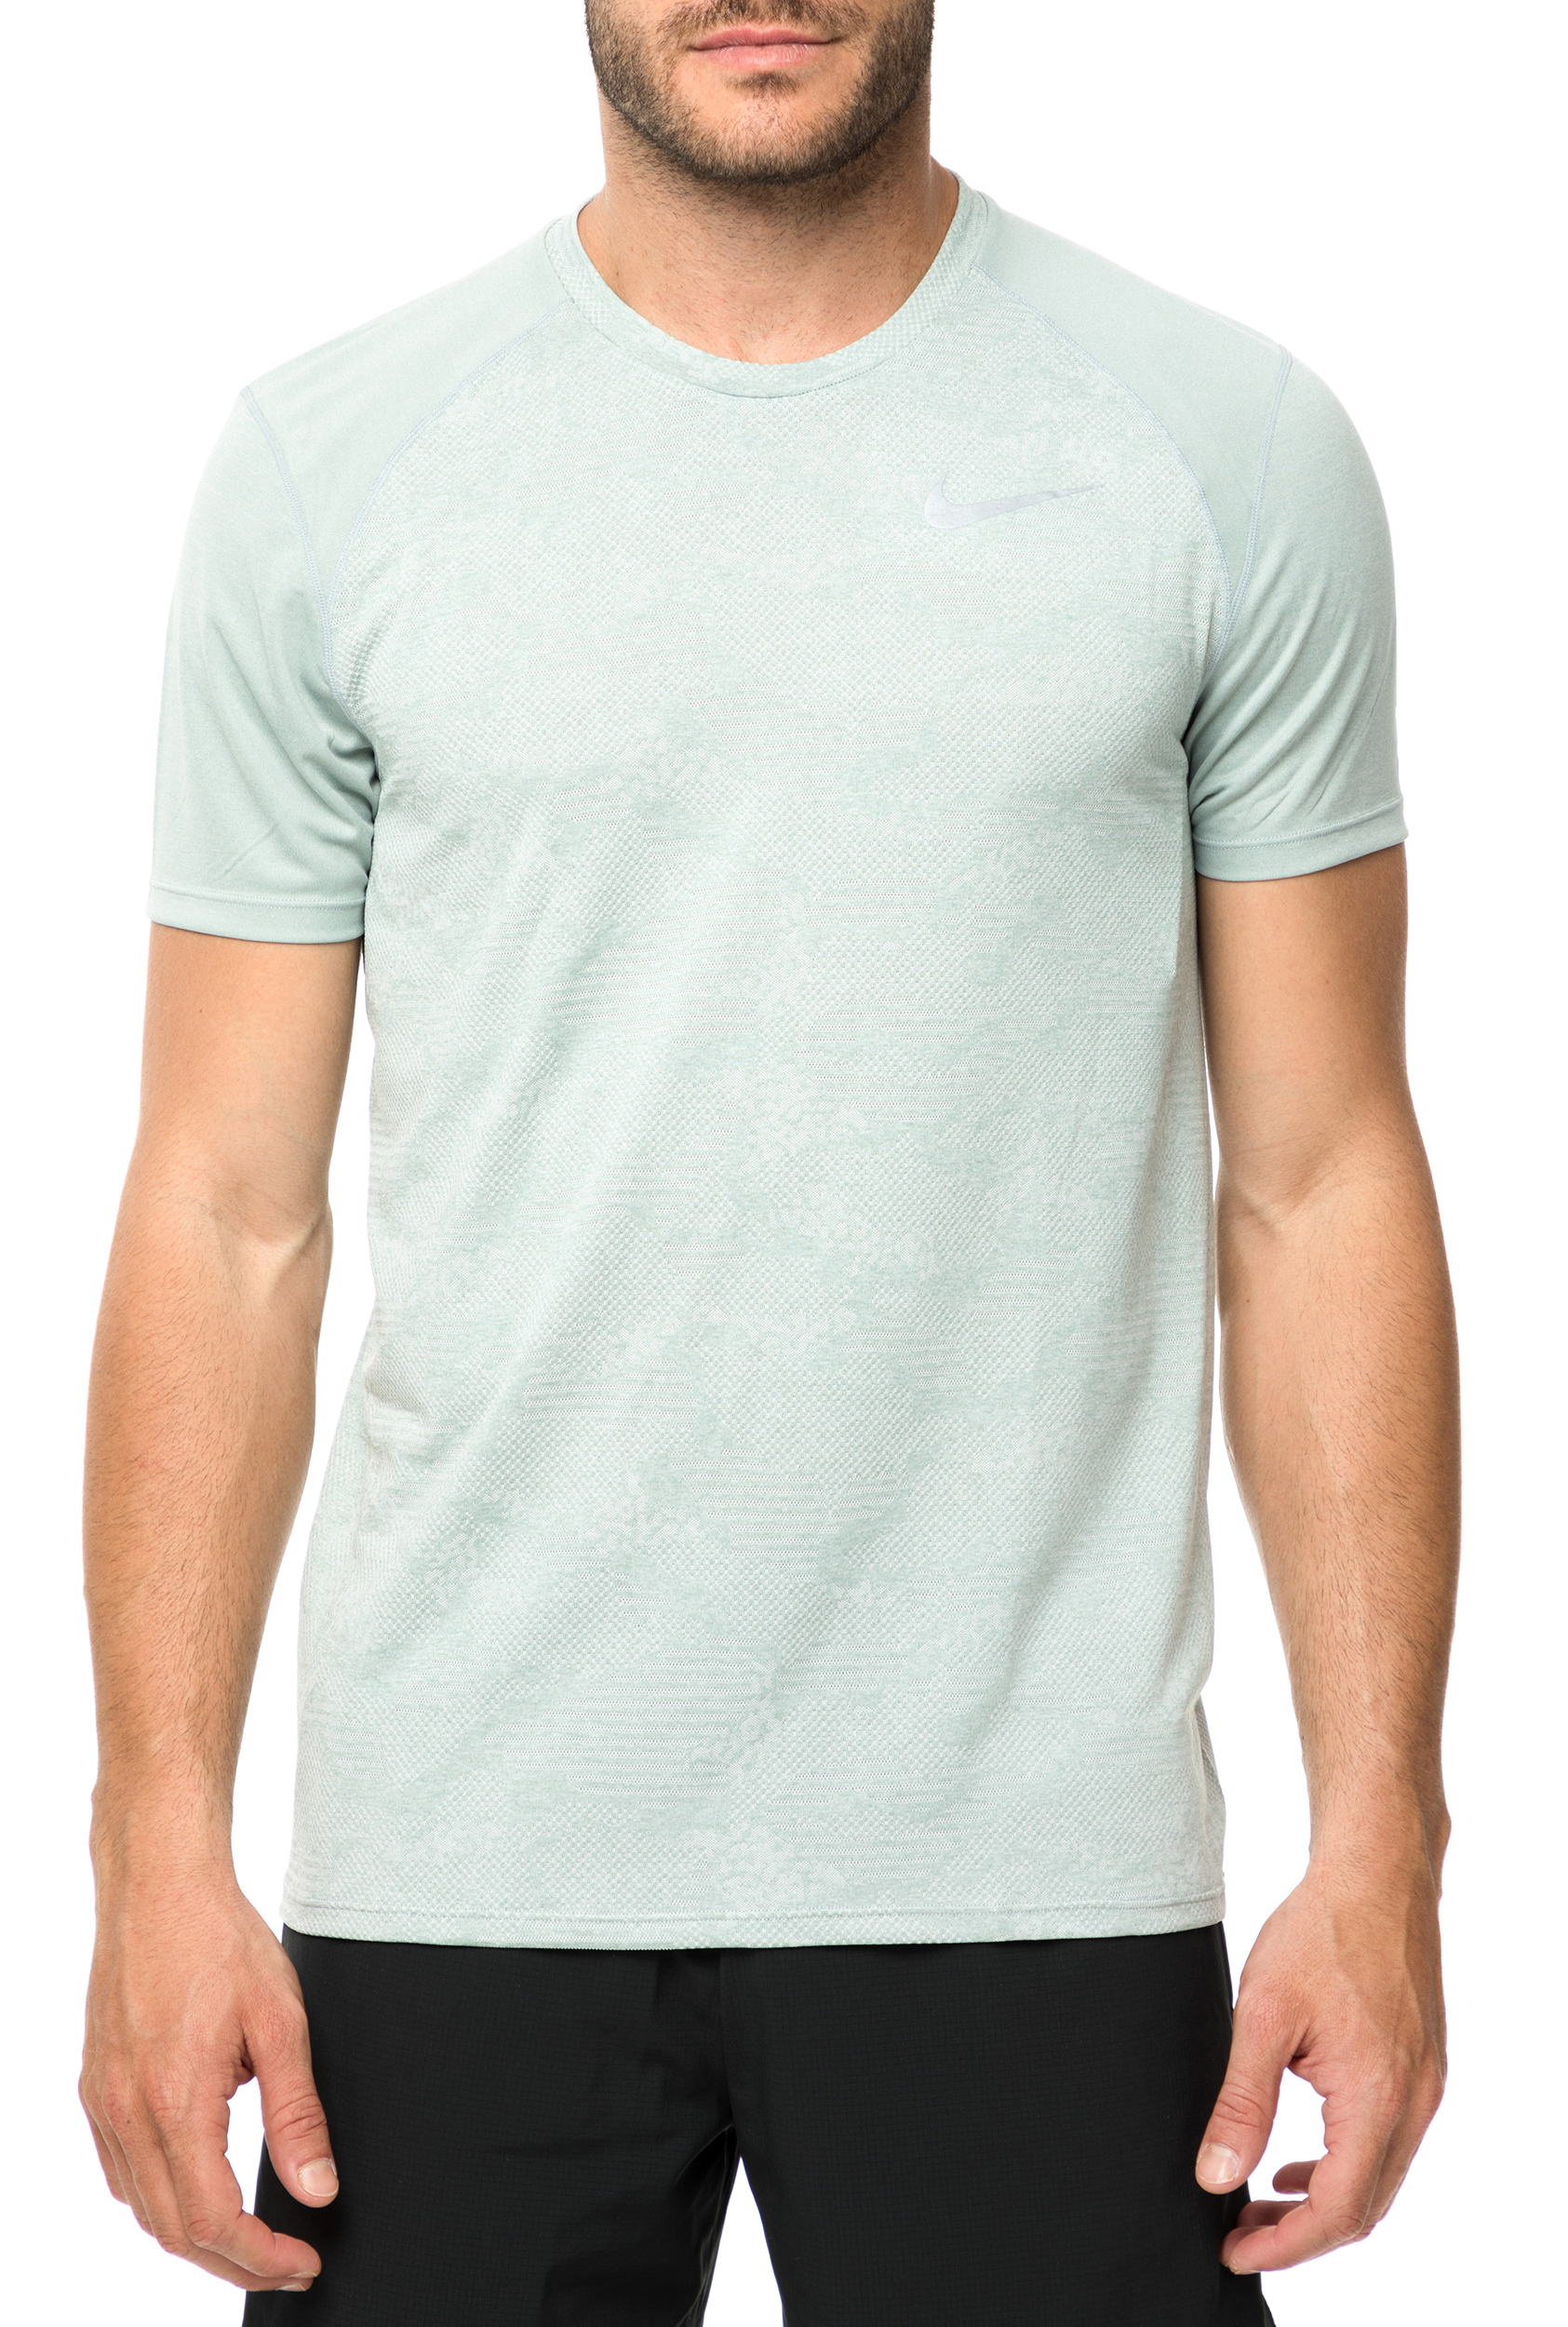 58df1cf81547 NIKE - Ανδρική κοντομάνικη μπλούζα NIKE BREATHE MILER